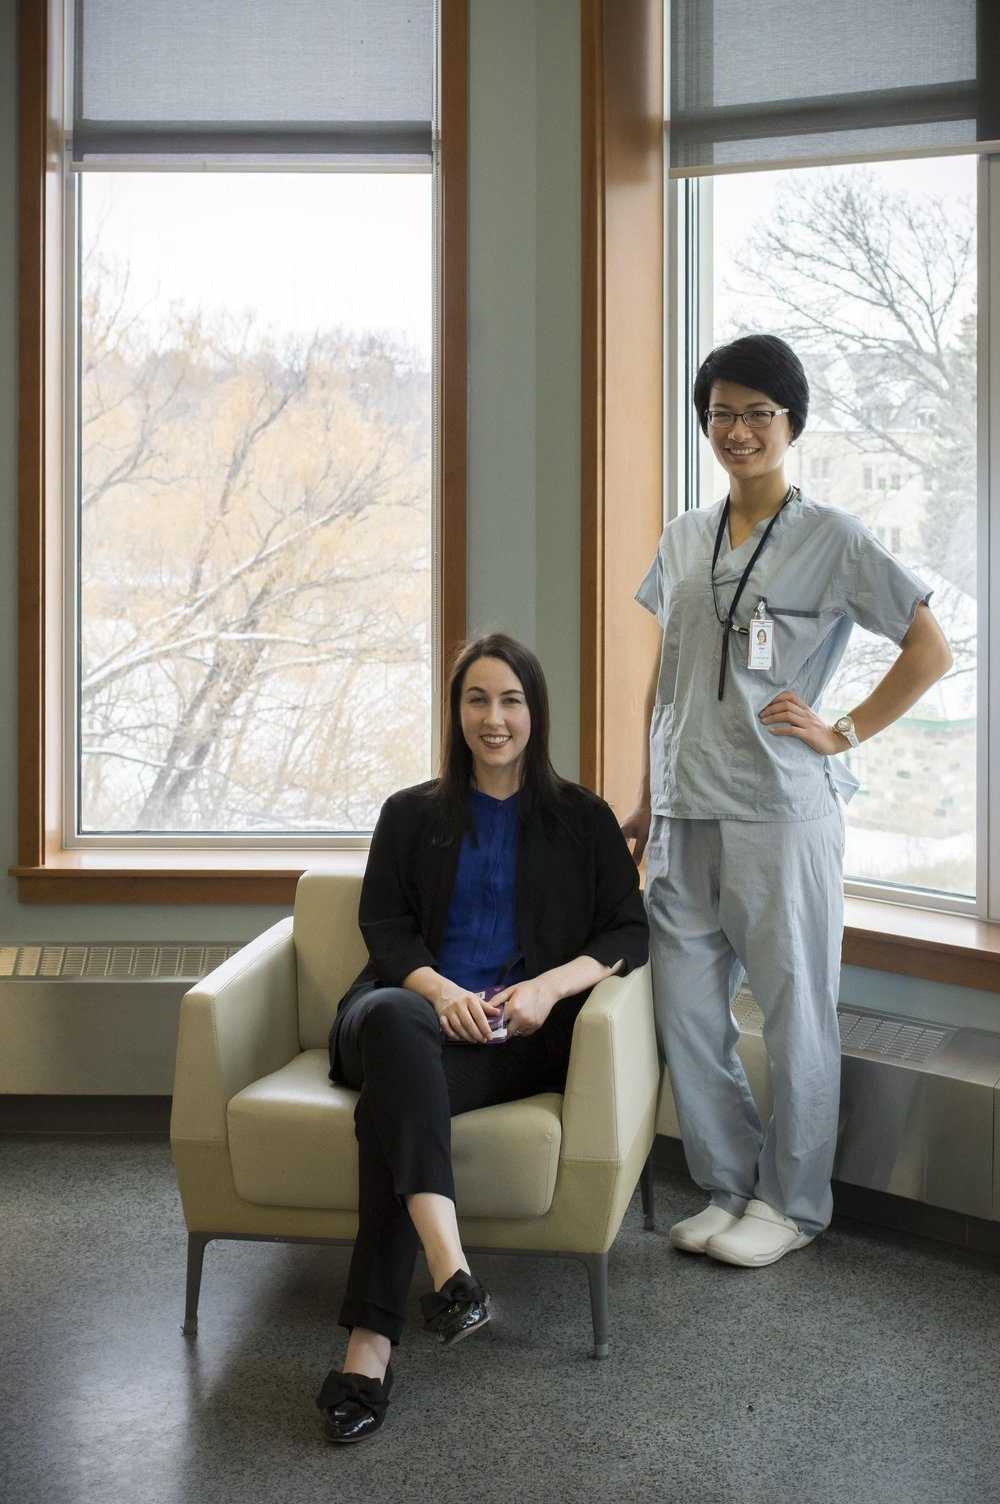 Dean's Project Students, Cheyenne Lawton and Bonnie Liu